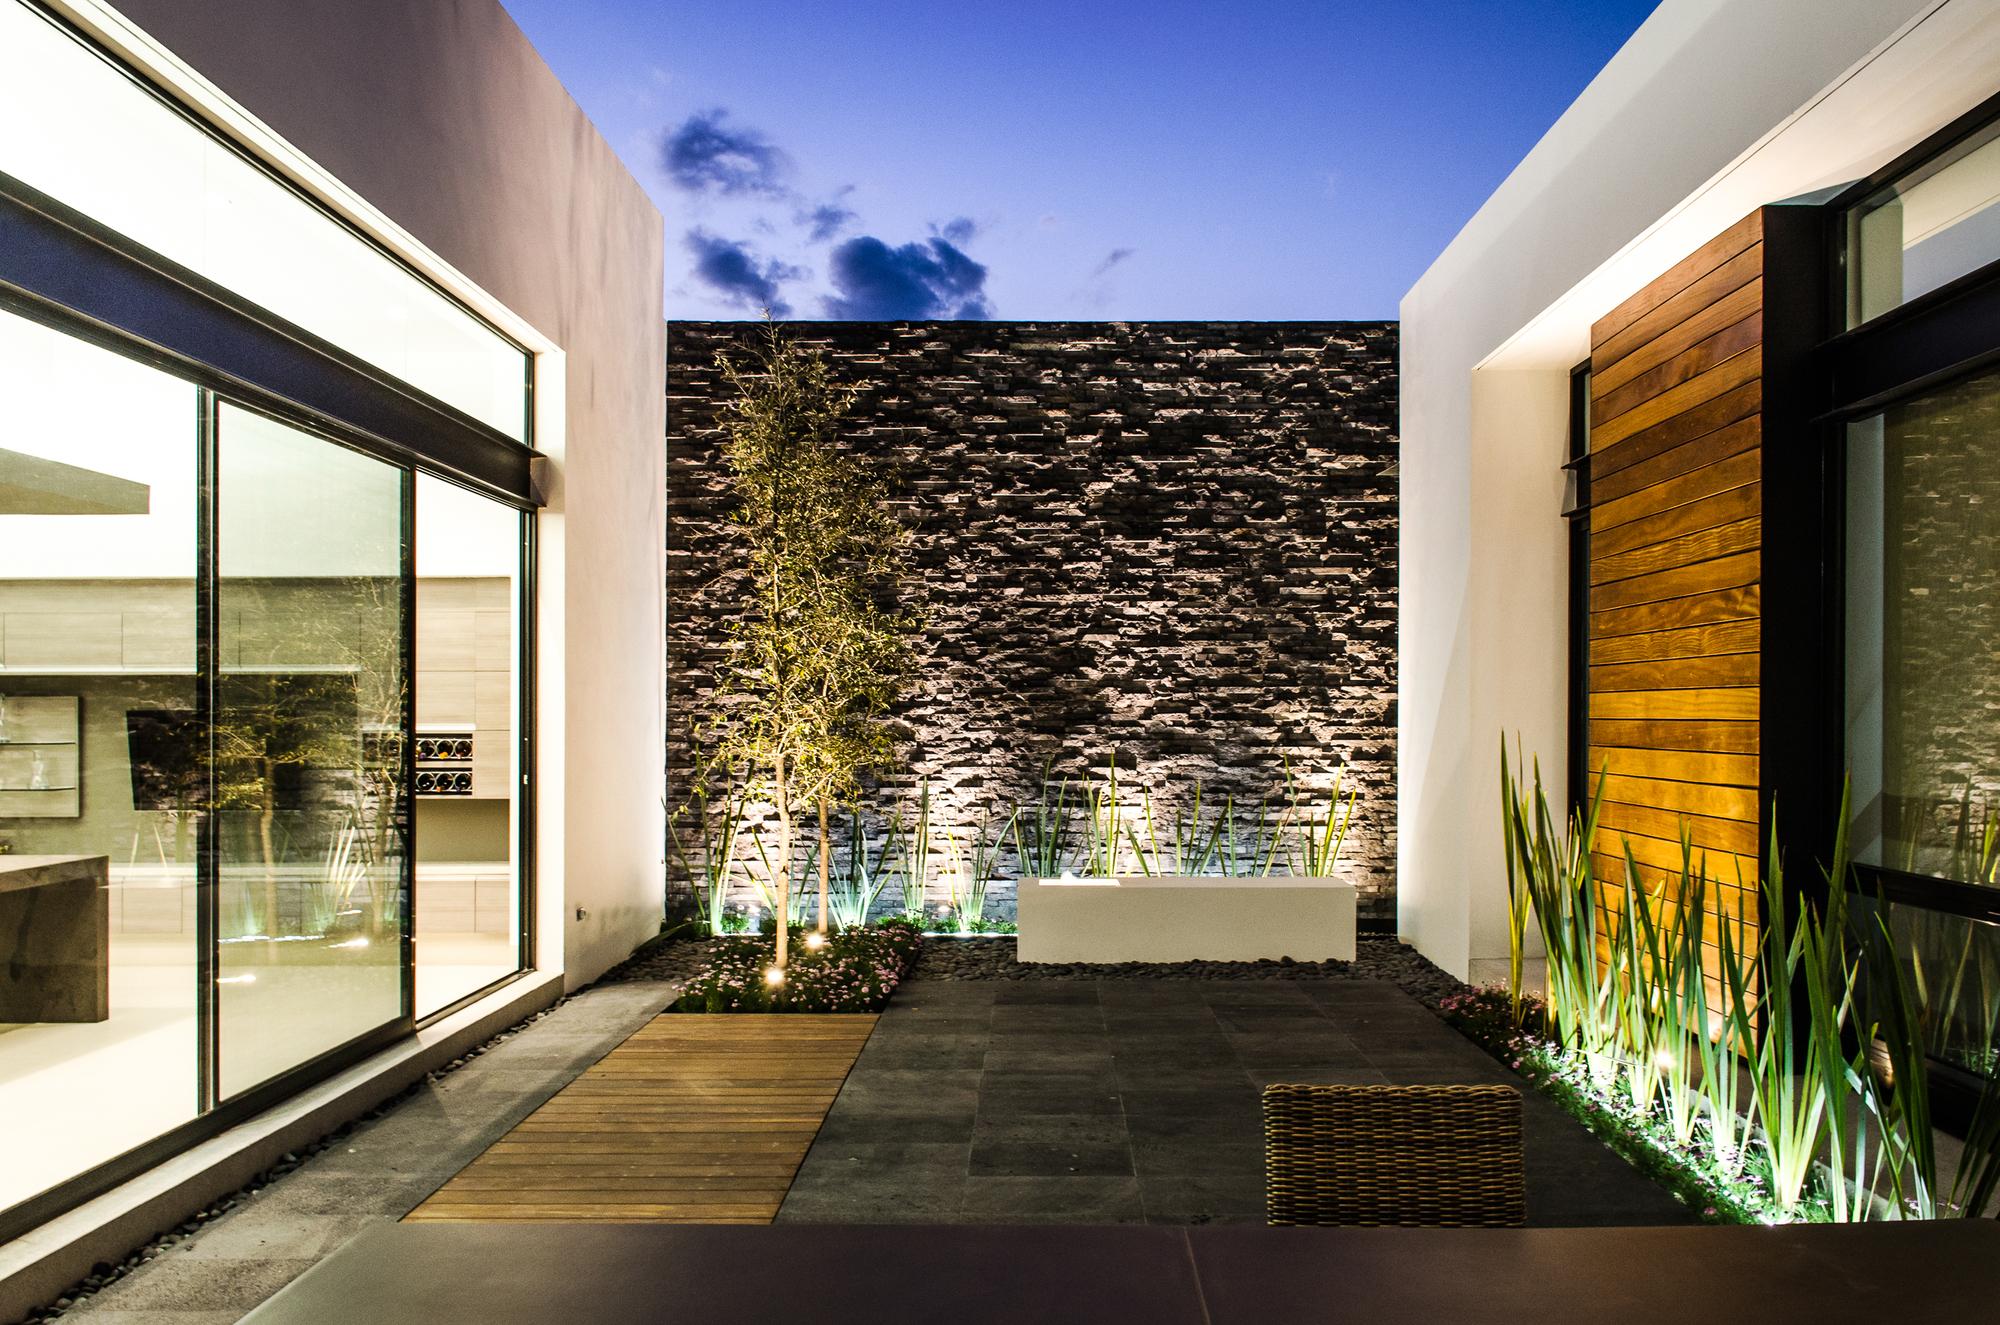 Galer a de casa agr adi arquitectura y dise o interior 9 for Diseno jardin interior